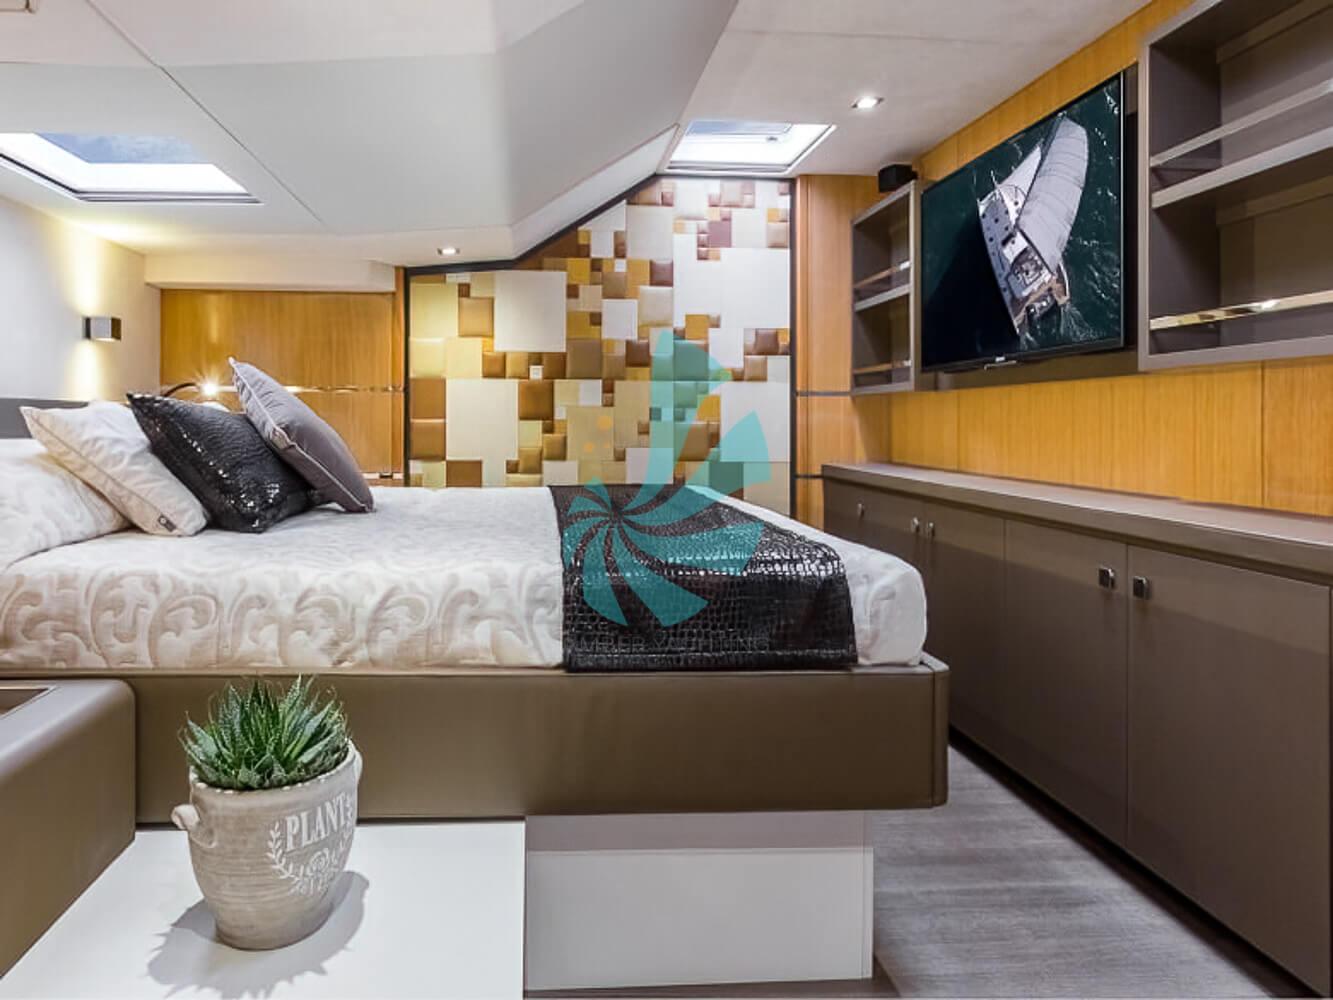 Catamaran a voile Privilege Série 6 chambre luxueuse et confortable, a vendre chez www.amber-yachting.com